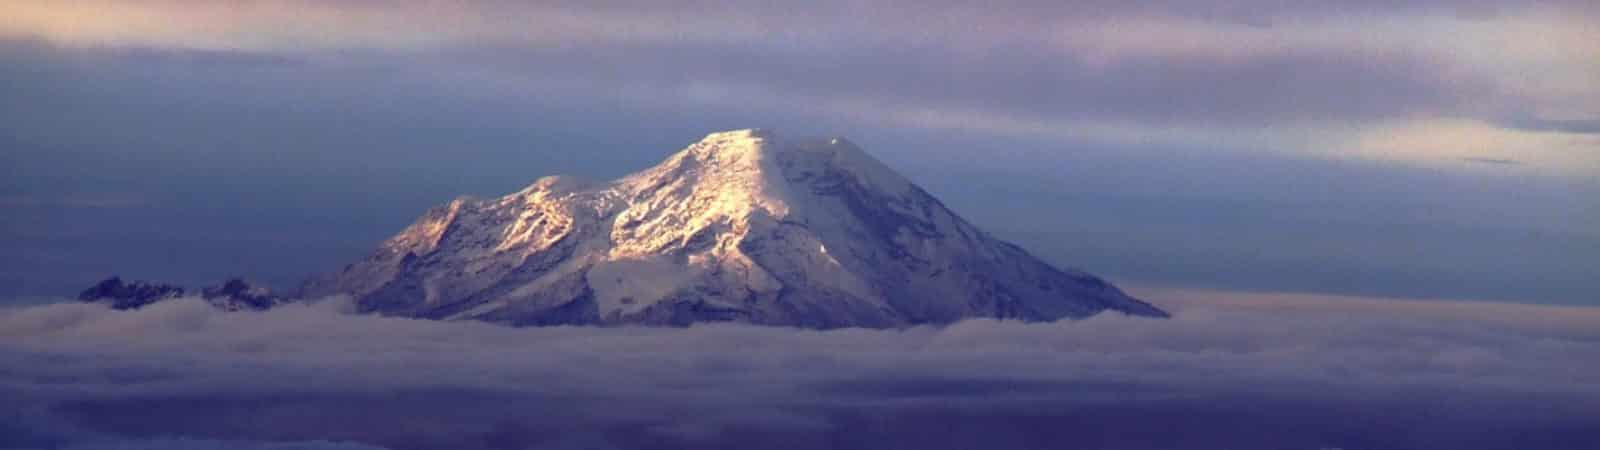 Chimborazo Volcano, the top of Ecuador